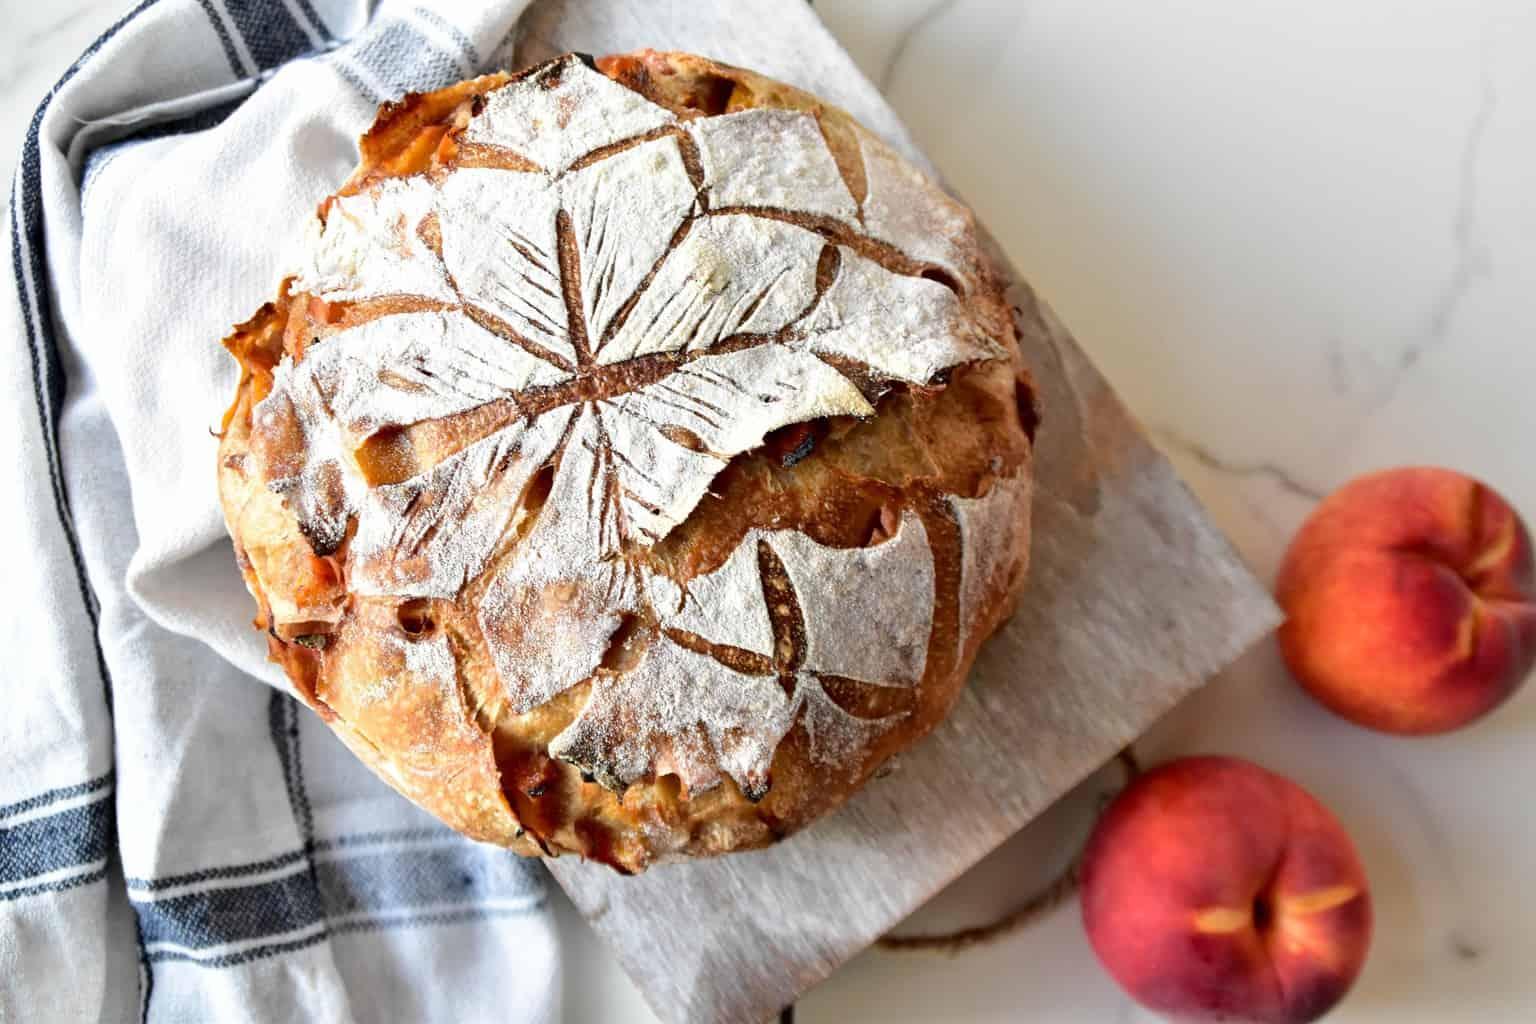 "<img src=""https://cdn.shortpixel.ai/client/q_glossy,ret_img,w_4096,h_2730/peach spelt sourdough bread .jpg"" alt="" peach spelt sourdough bread with peaches"">"